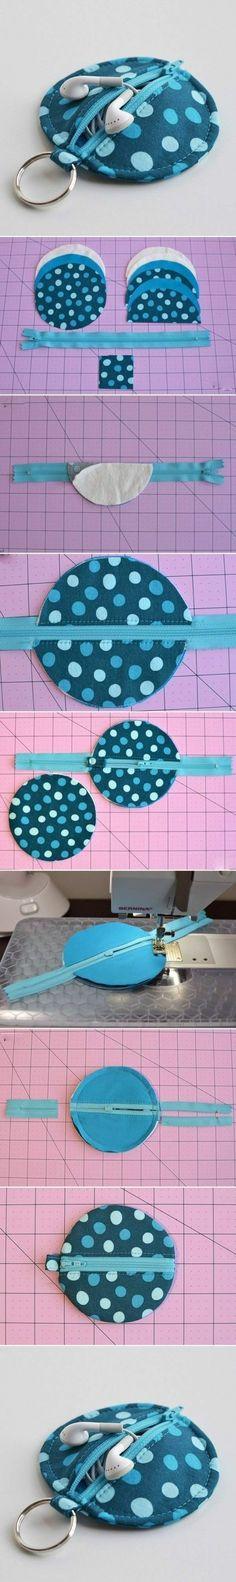 DIY Earphone Case diy craft crafts easy crafts sewing easy diy diy craft sewing ideas sewing tutorials easy sewing ideas in circle? Easy Sewing Projects, Craft Tutorials, Sewing Hacks, Sewing Tutorials, Sewing Crafts, Sewing Patterns, Diy Projects, Sewing Tips, Sewing Ideas